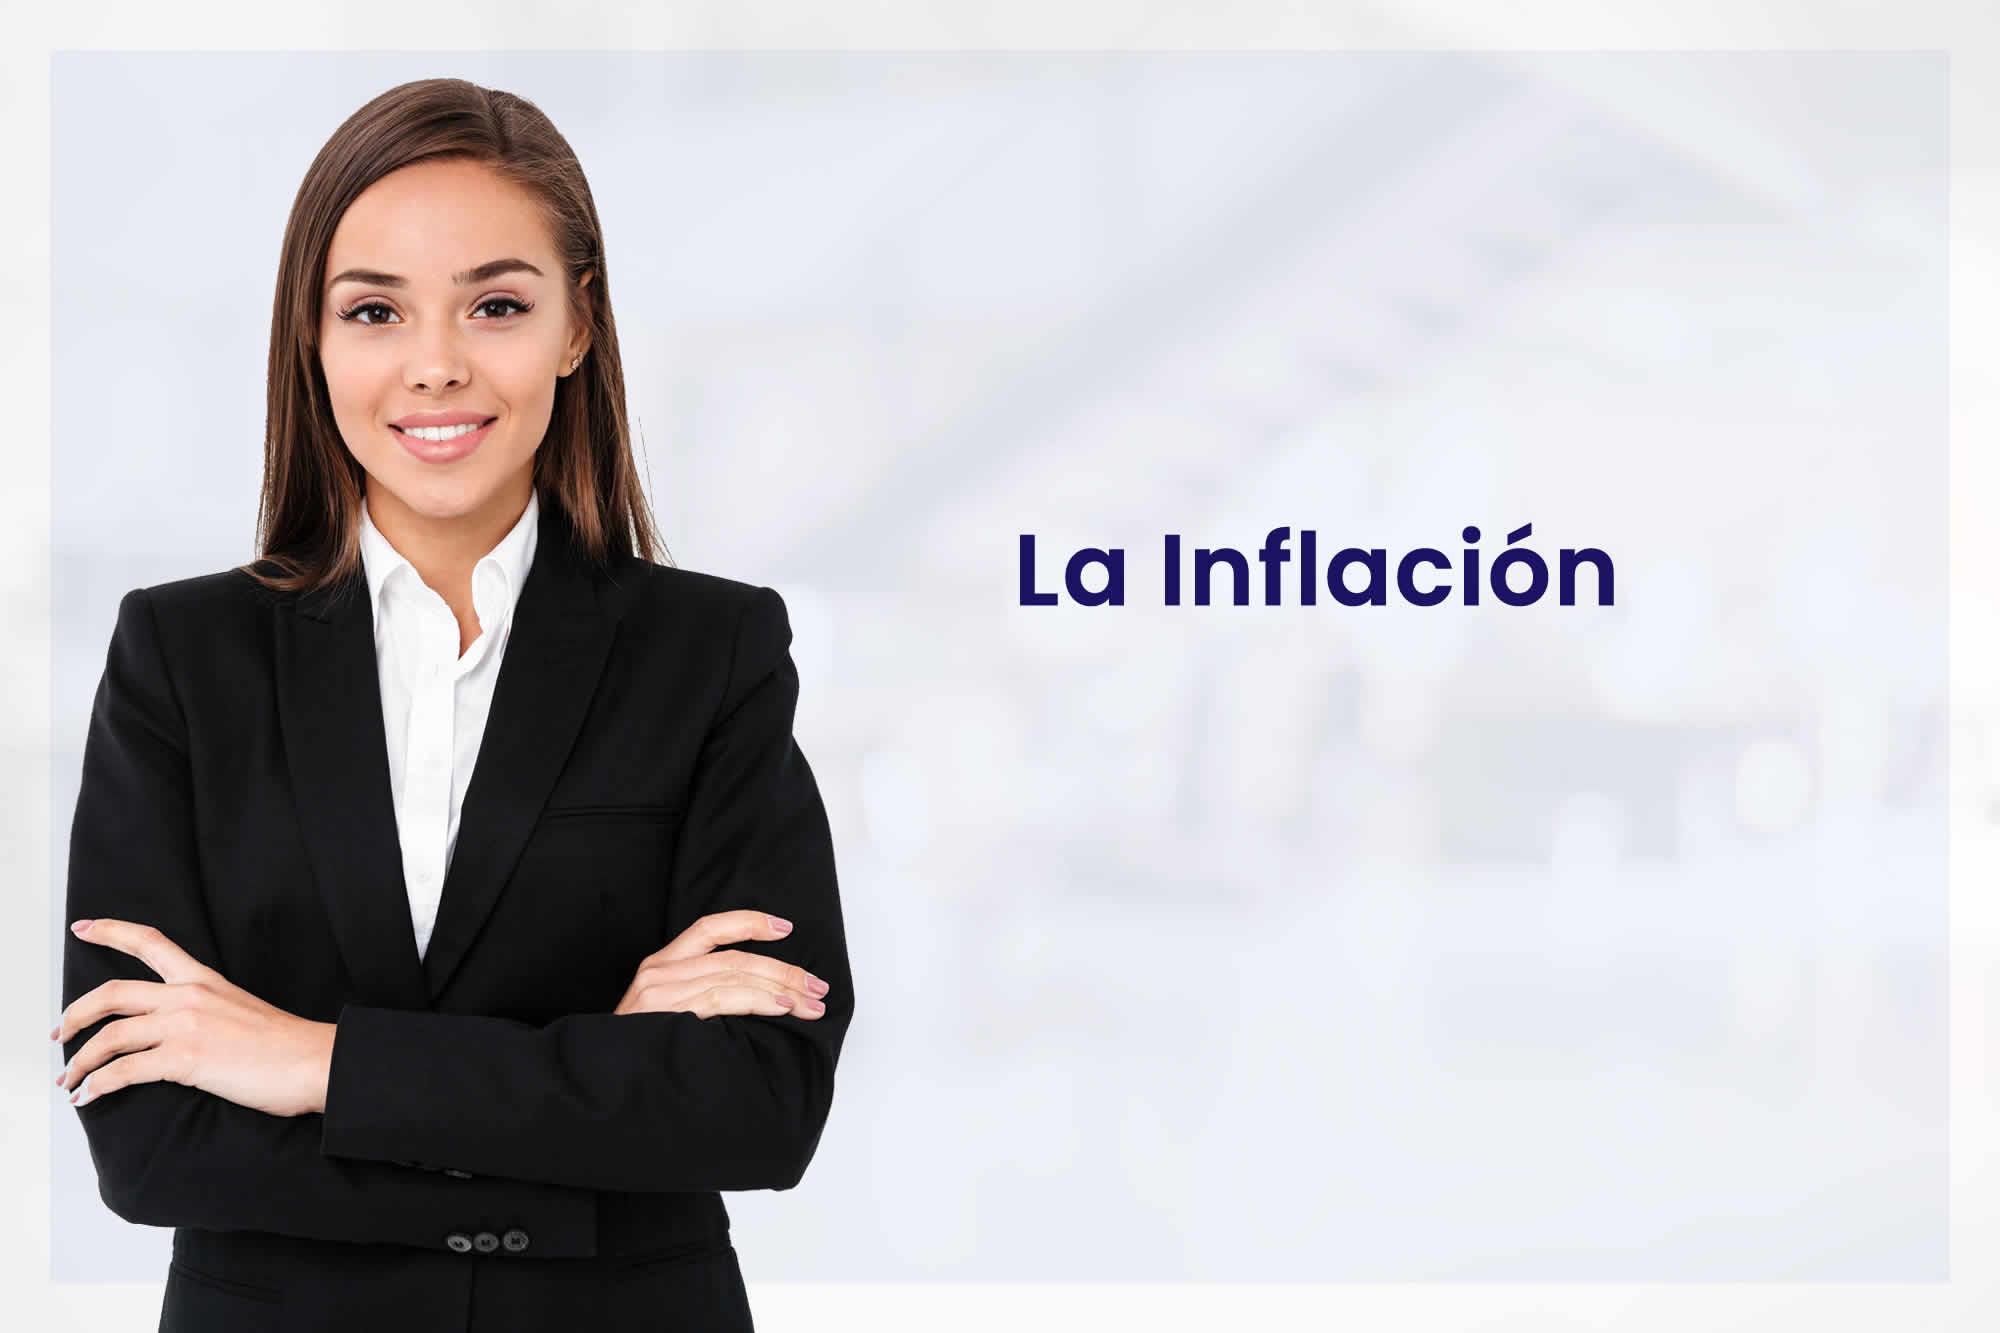 INKARIPERU | INFLACION